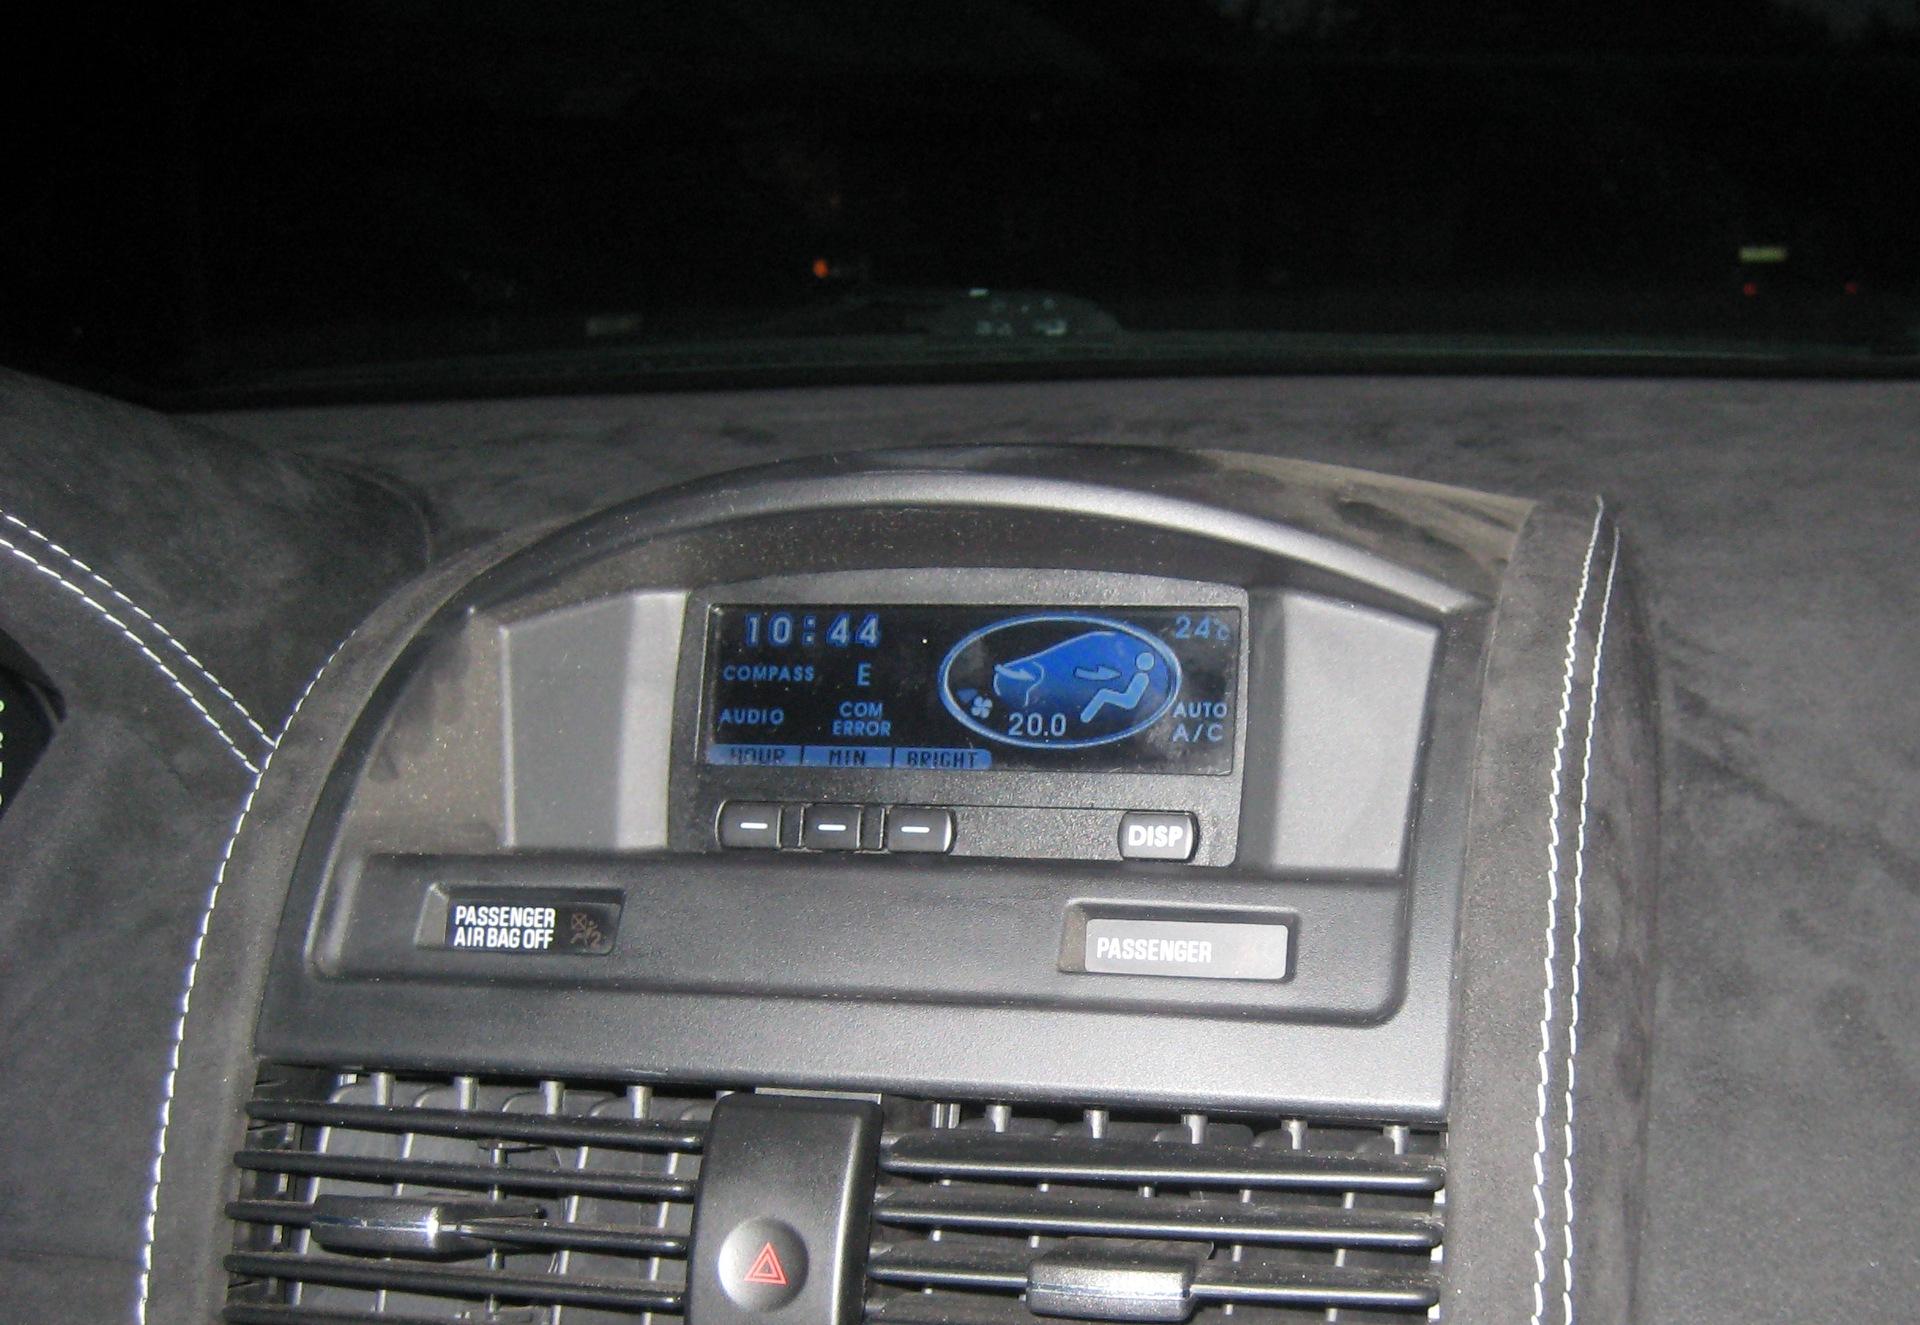 митсубиси галант 9 дисплей монитор